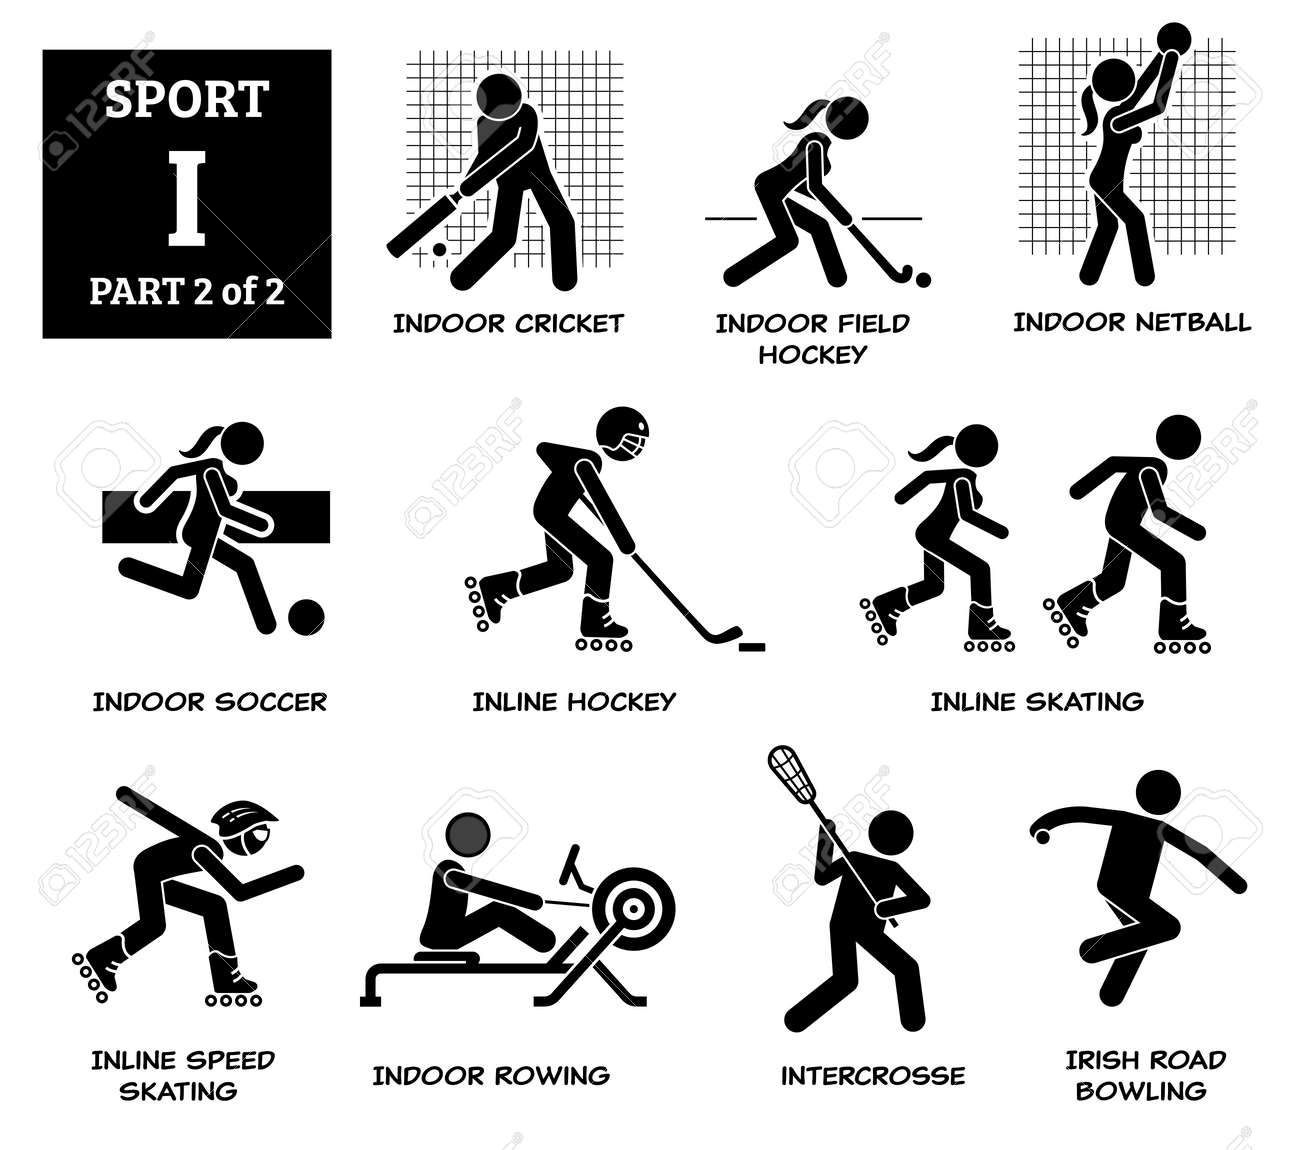 Sport games alphabet I vector icons pictogram. Indoor cricket, field hockey, netball, indoor soccer, inline hockey, inline skating, speed skating, rowing, intercrosse, Irish road bowling. - 173056754